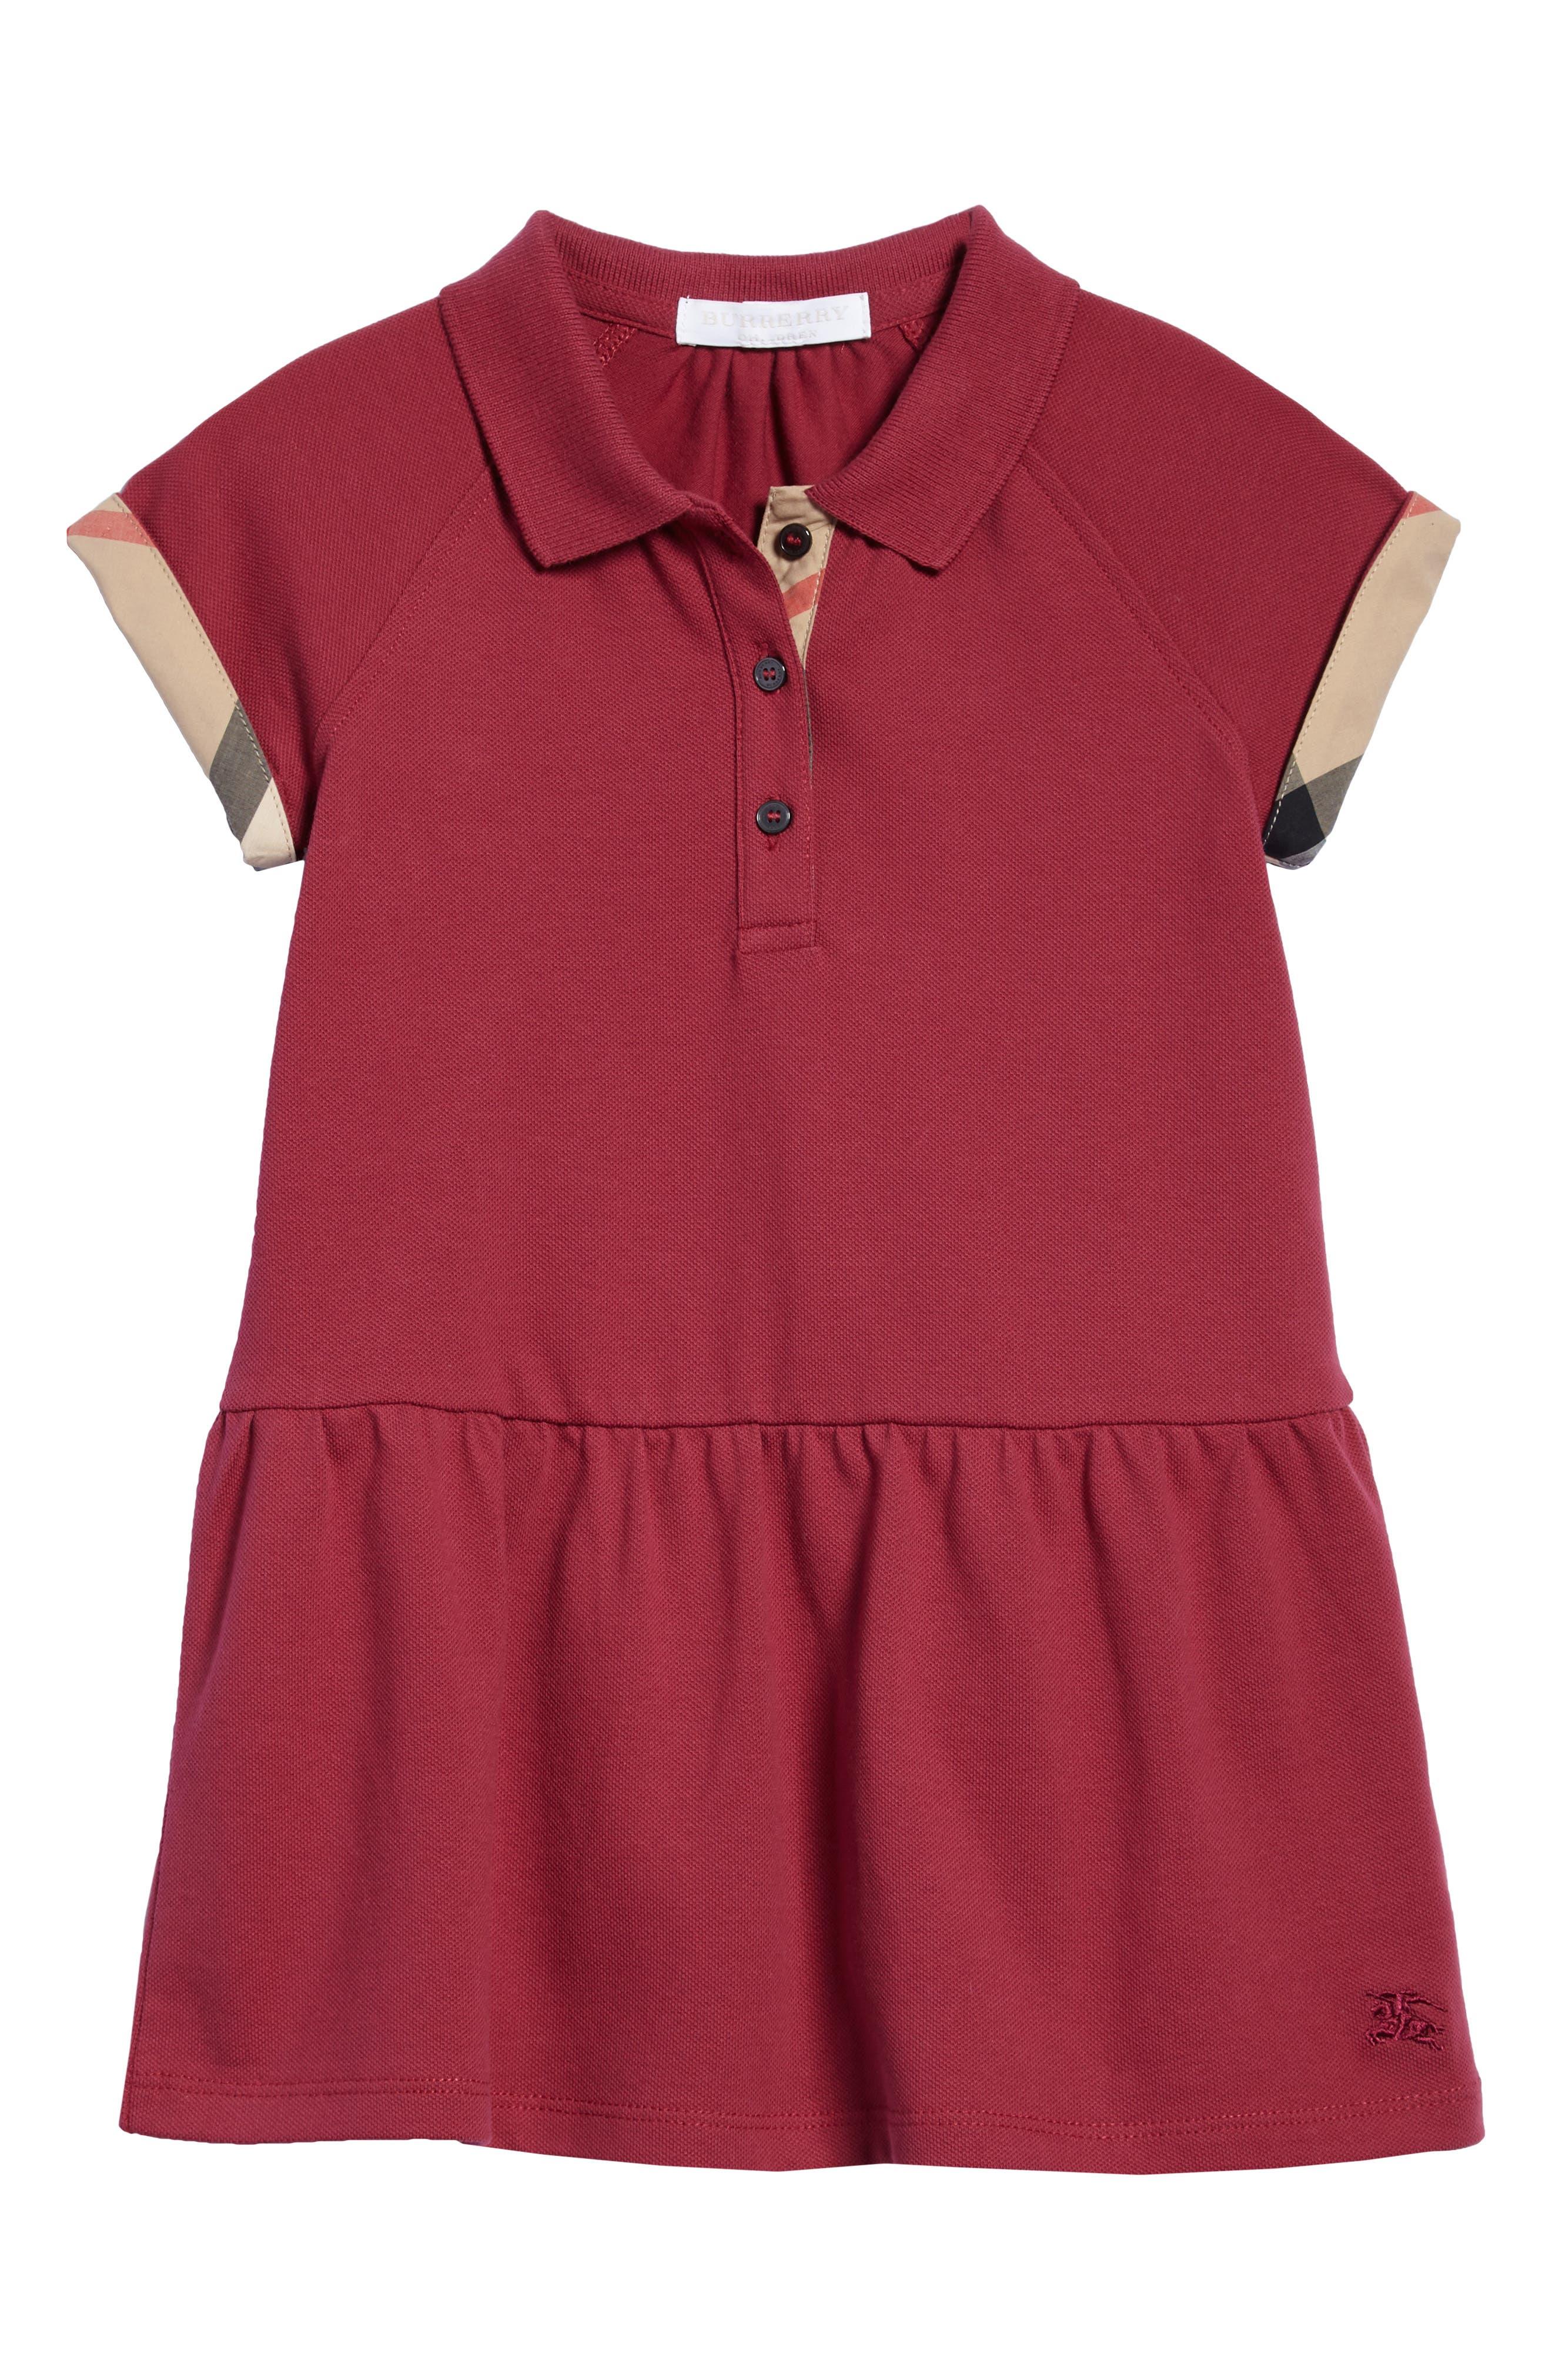 Burberry Mini Cali Polo Dress (Baby Girls & Toddler Girls)